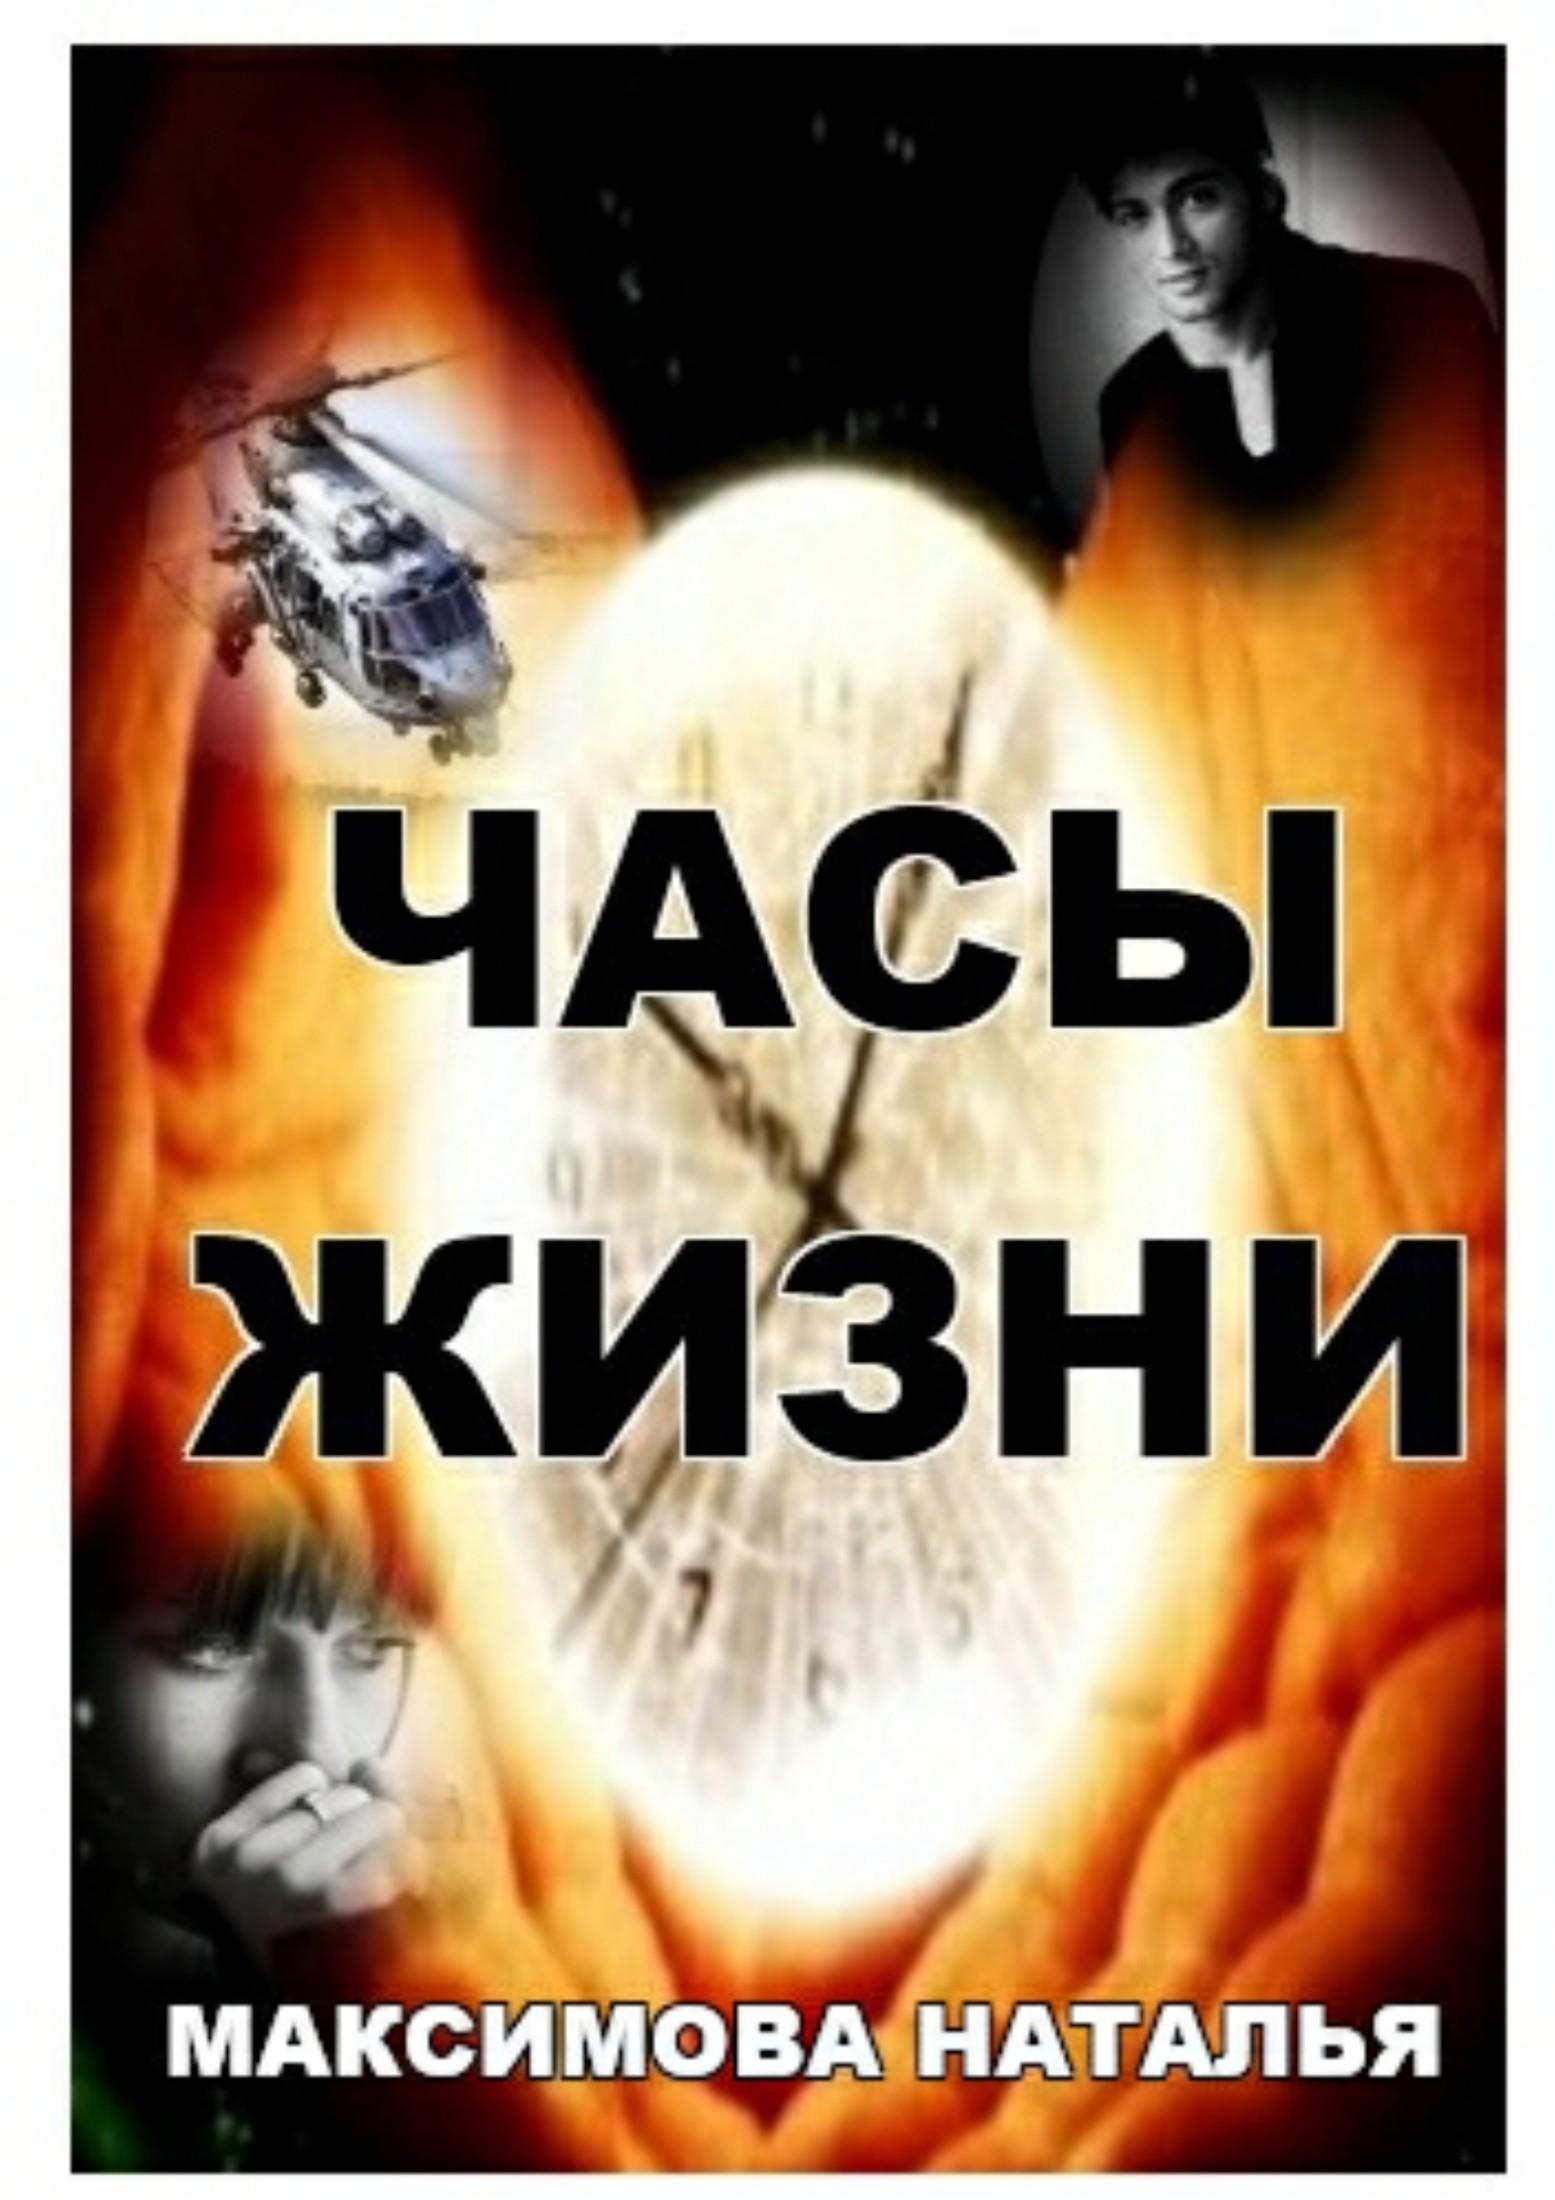 Наталья Максимова «Часы жизни»